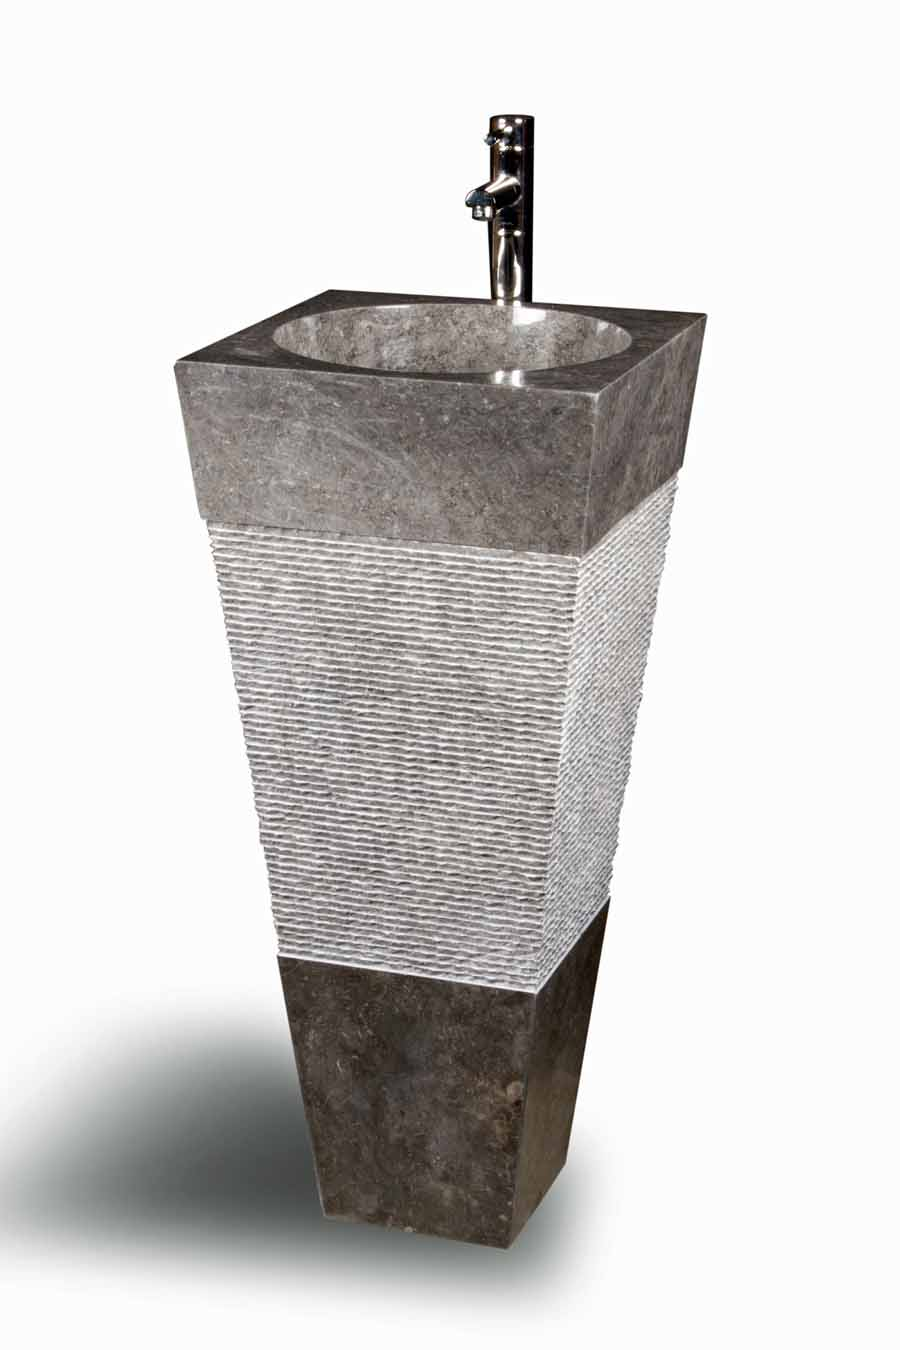 Bathroom Shower Tile Showroom besides JBL Speaker Cabi  Design Plans besides Kitchen Cabi  Refinishing Kit Rust Oleum besides Plumbing Shower Valve as well Decorating Dining Room Table. on wood cabinet diagram